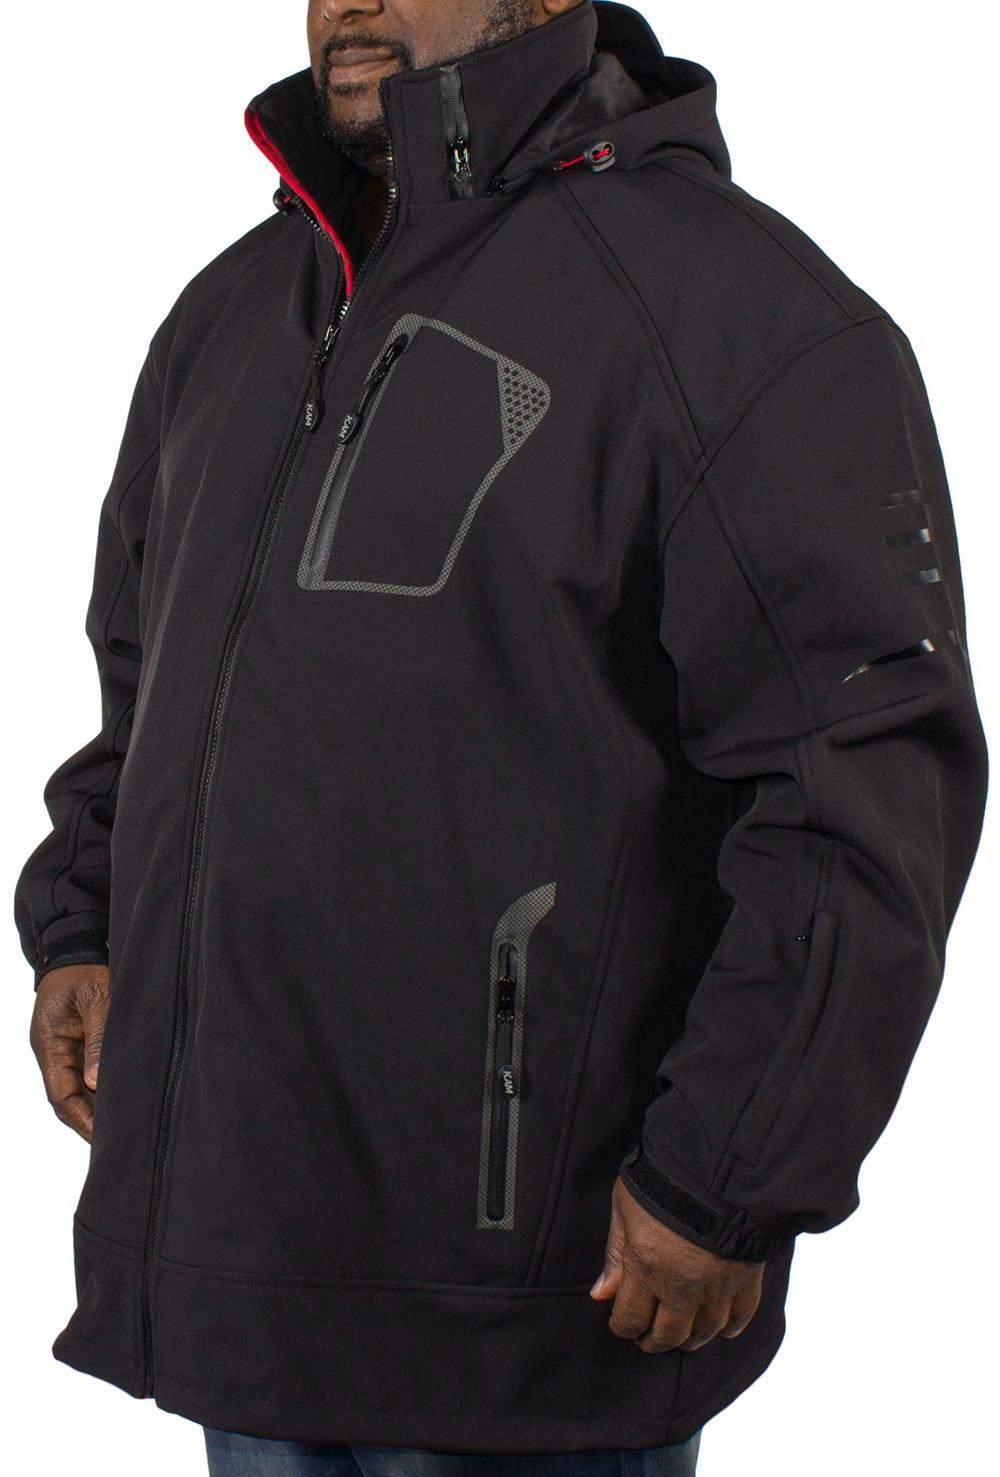 KAM Soft Shell Performance Jacket Black